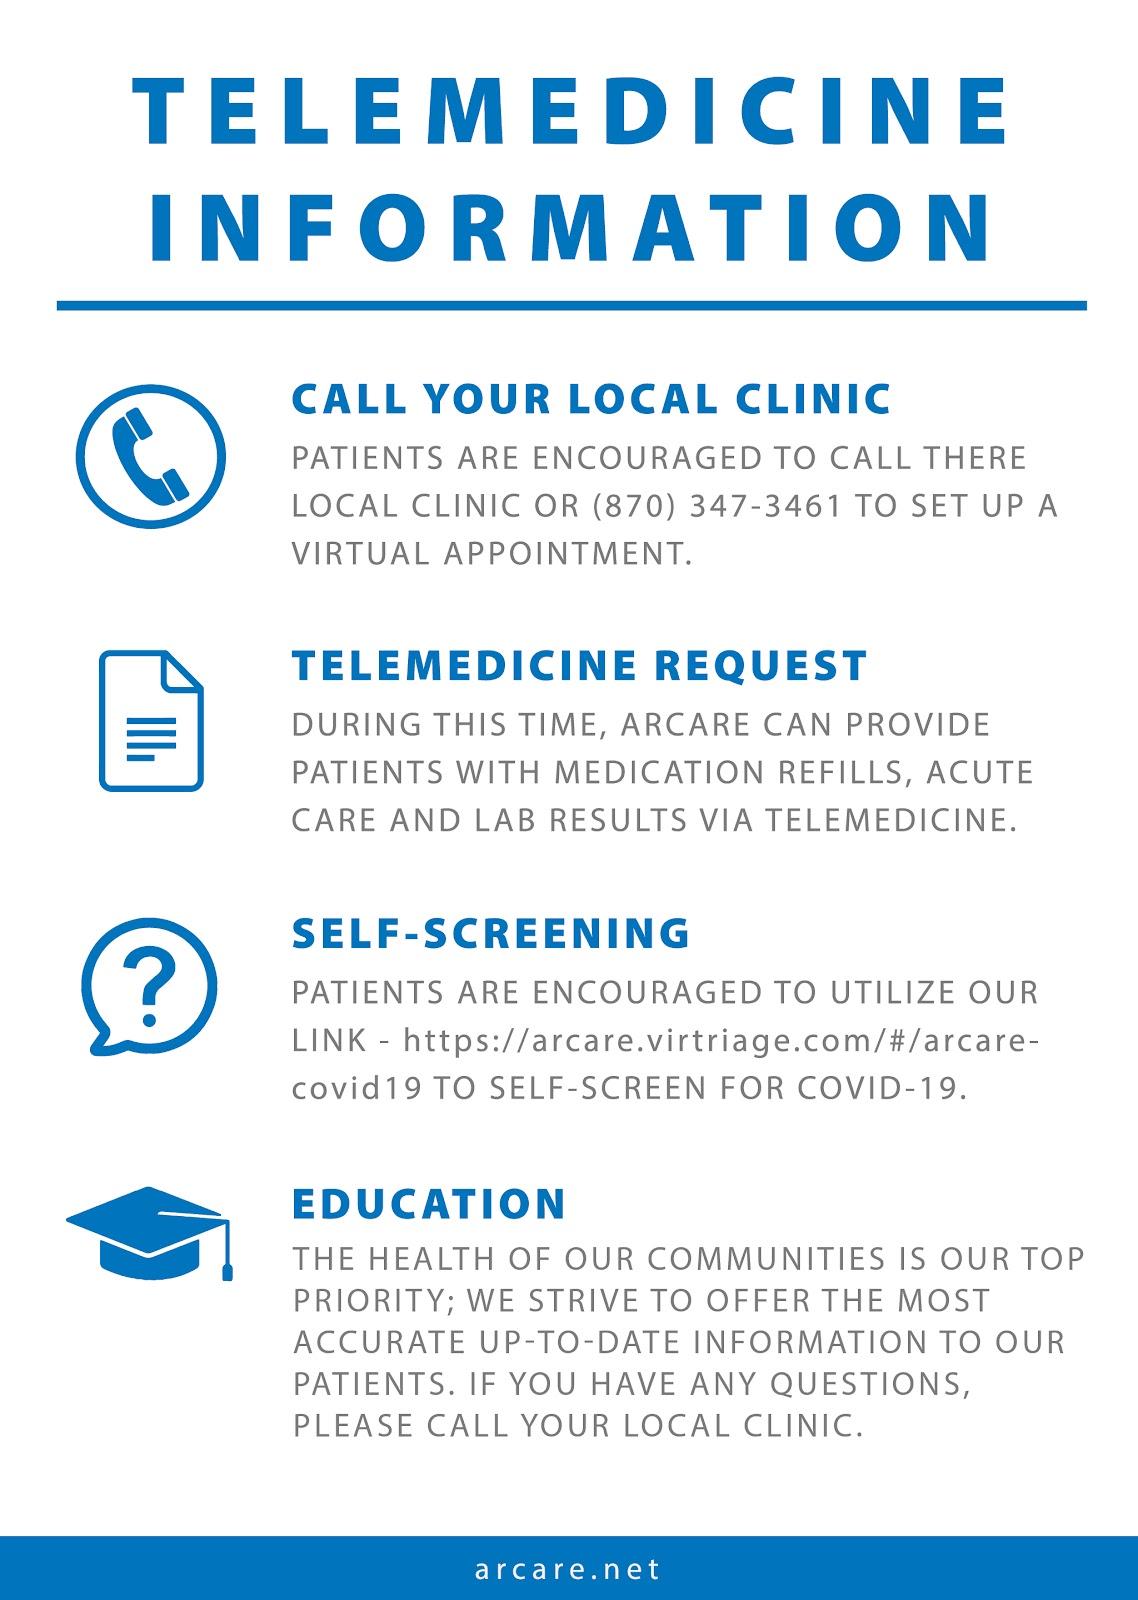 Telemedicine Infomation